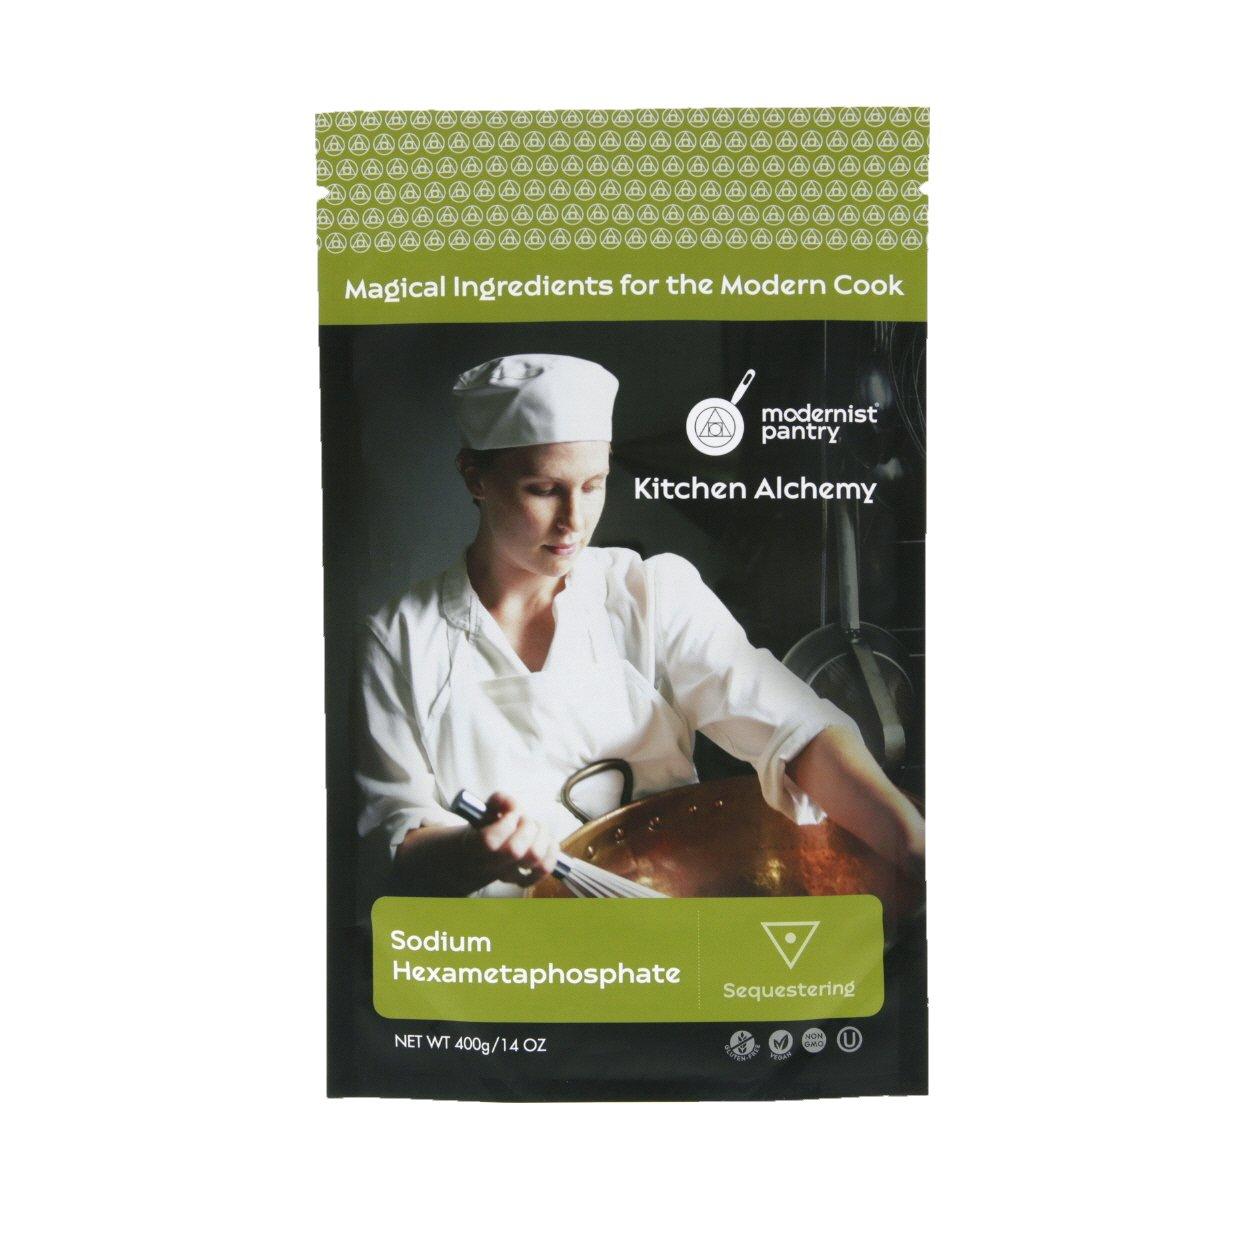 Pure Sodium Hexametaphosphate (Molecular Gastronomy) ⊘ Non-GMO ☮ Vegan ✡ OU Kosher Certified - 400g/14oz